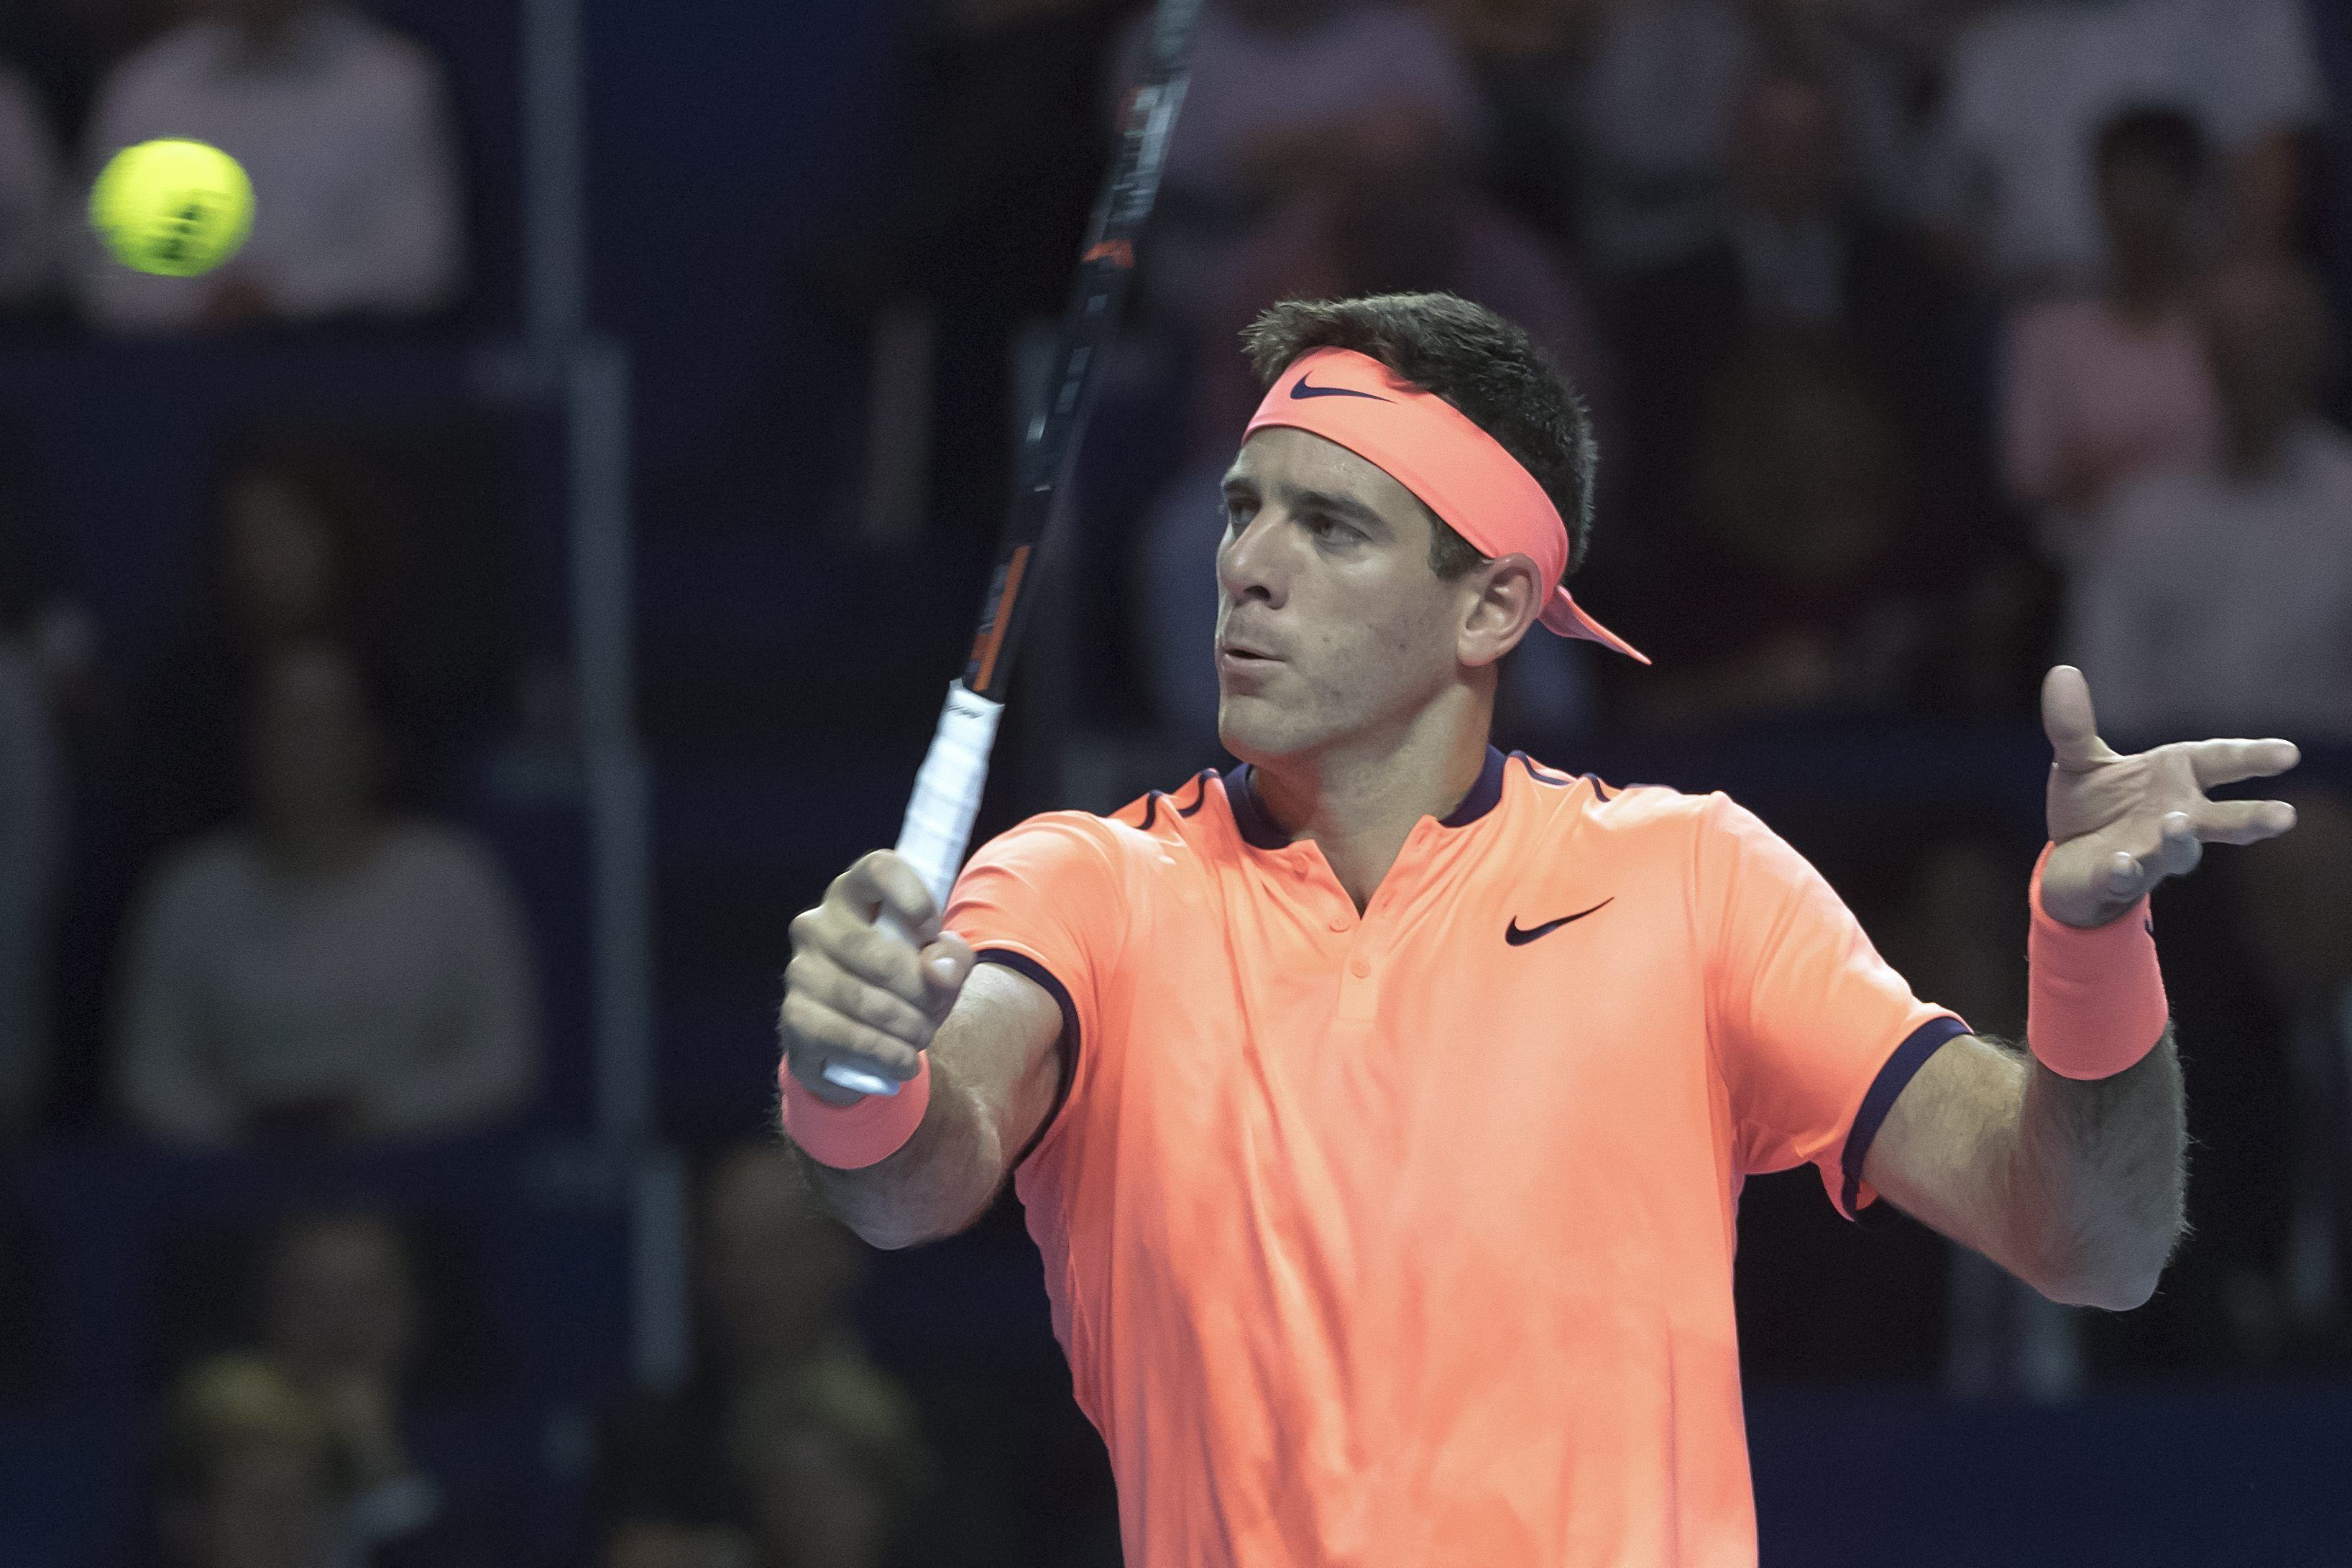 Juan Martín Del Potro venció al holandés Robin Haase por la primera ronda del ATP de Basilea